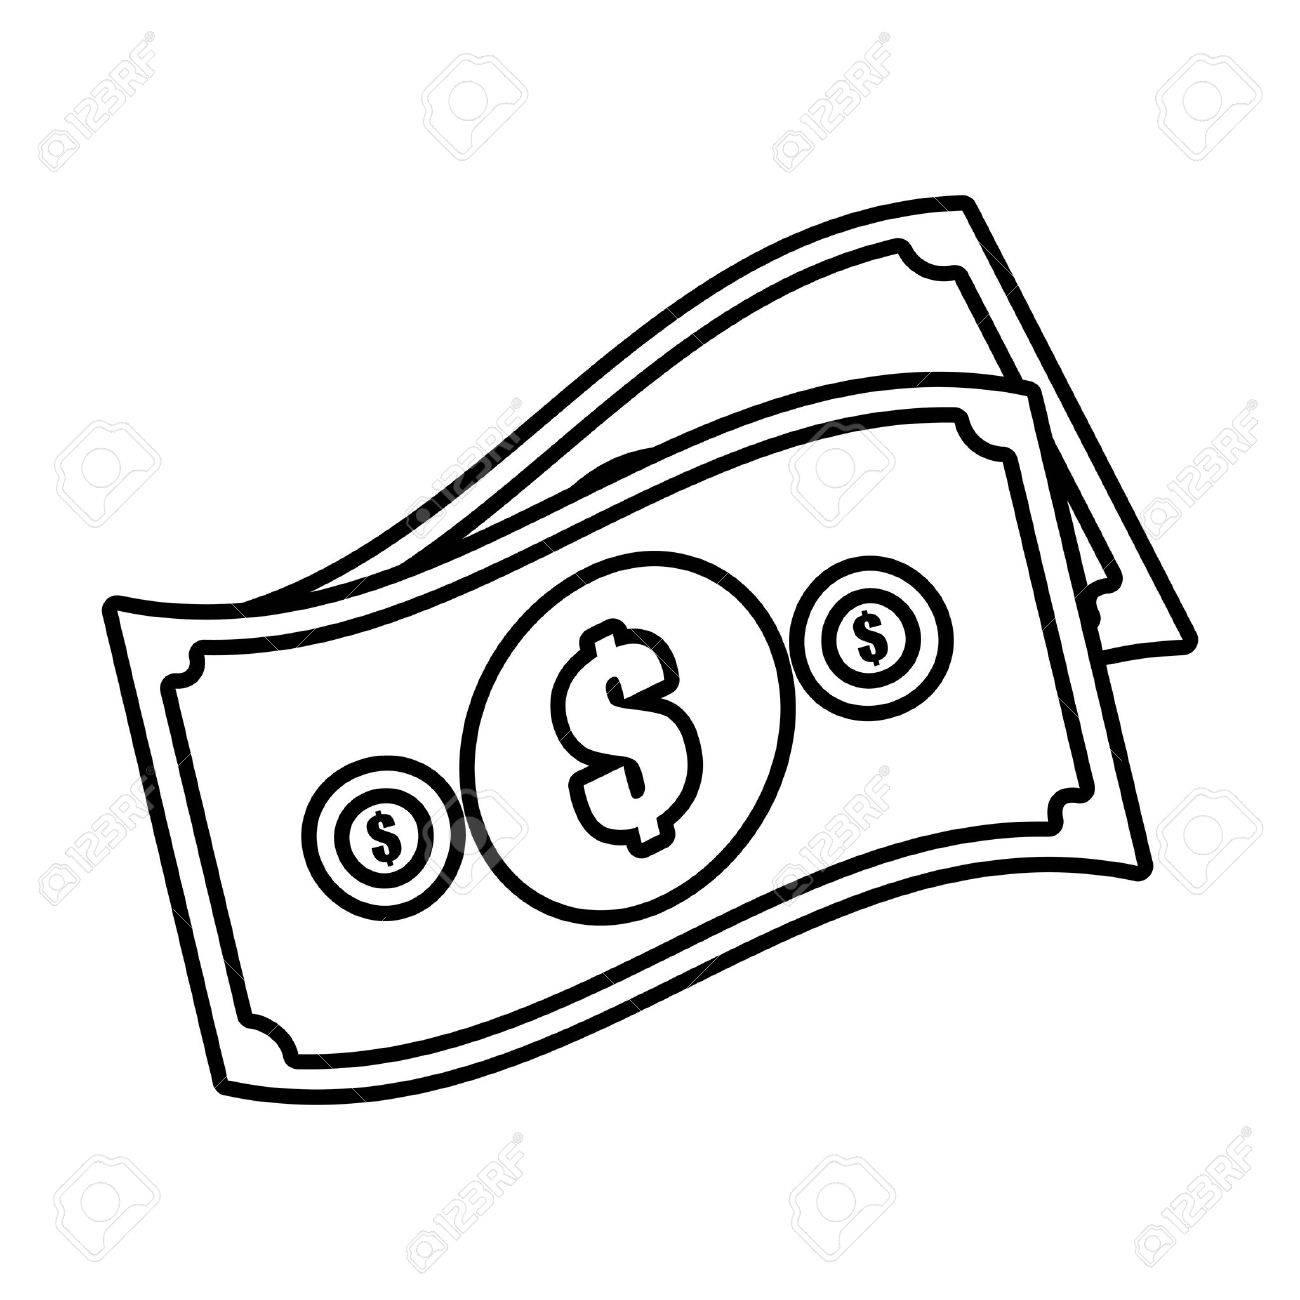 money bills cash dollar design outline vector illustration eps rh 123rf com